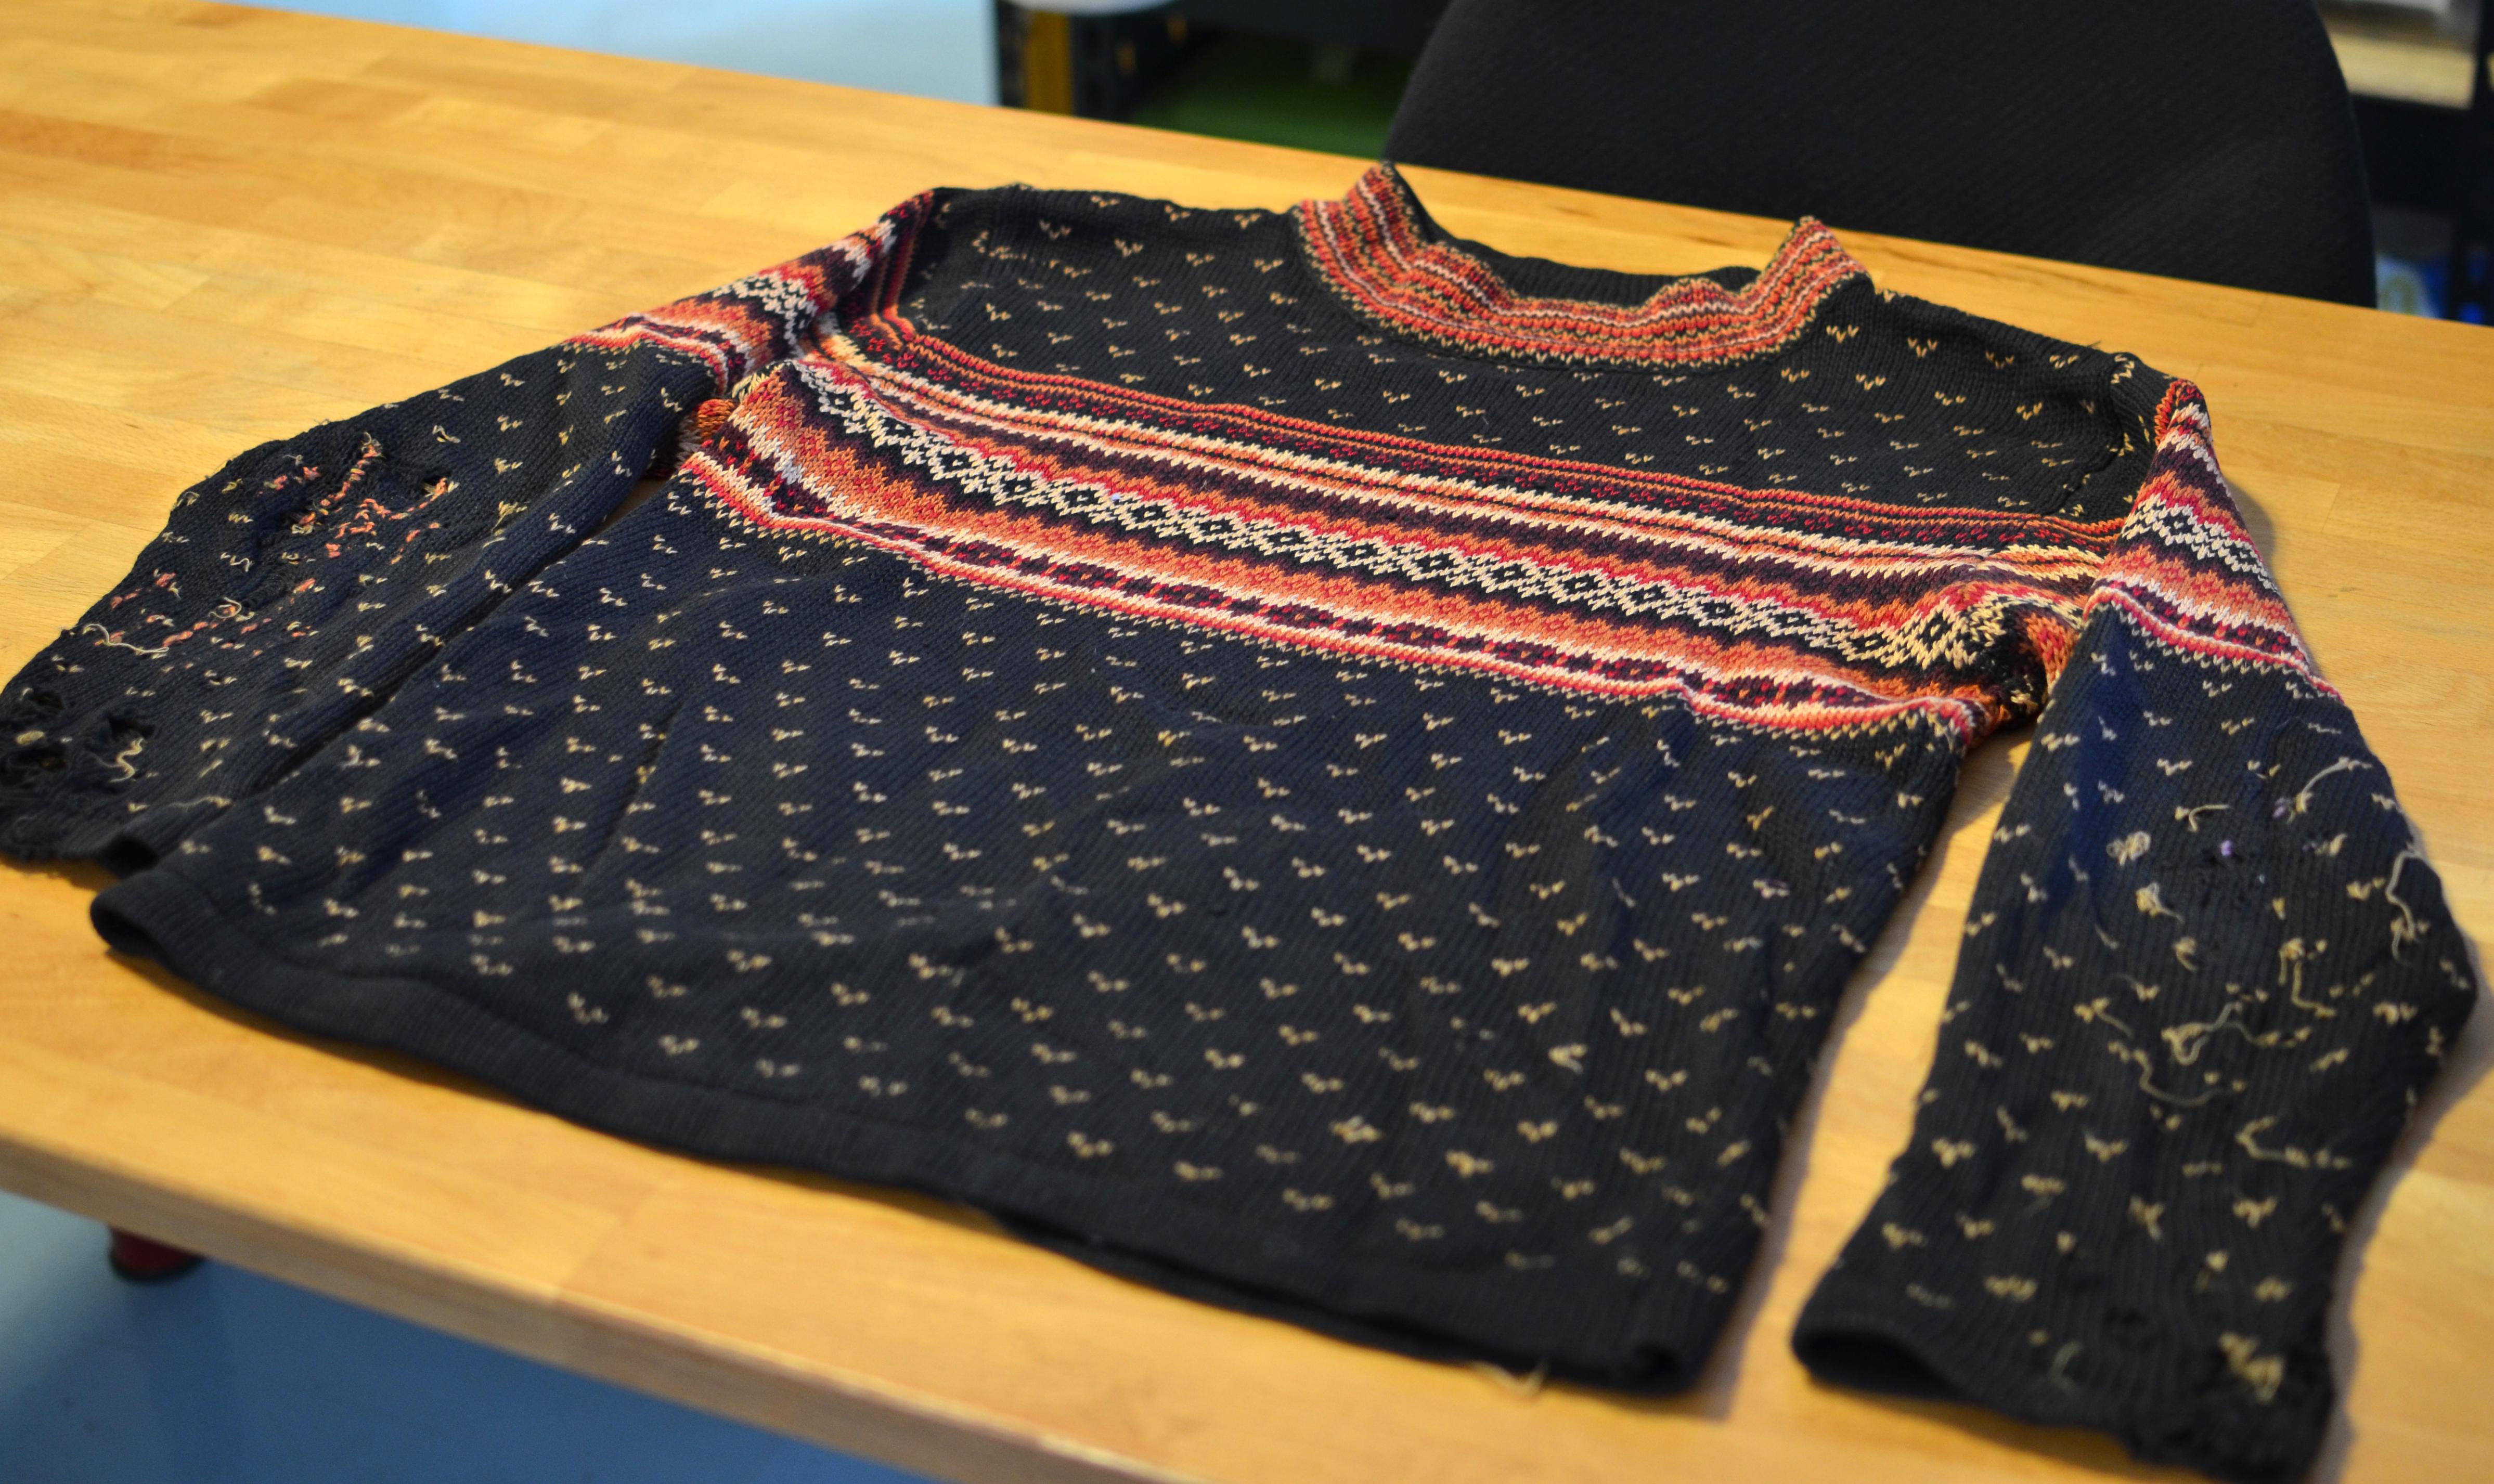 adafruit_products_lous-xmas-sweater-mod-00.jpg